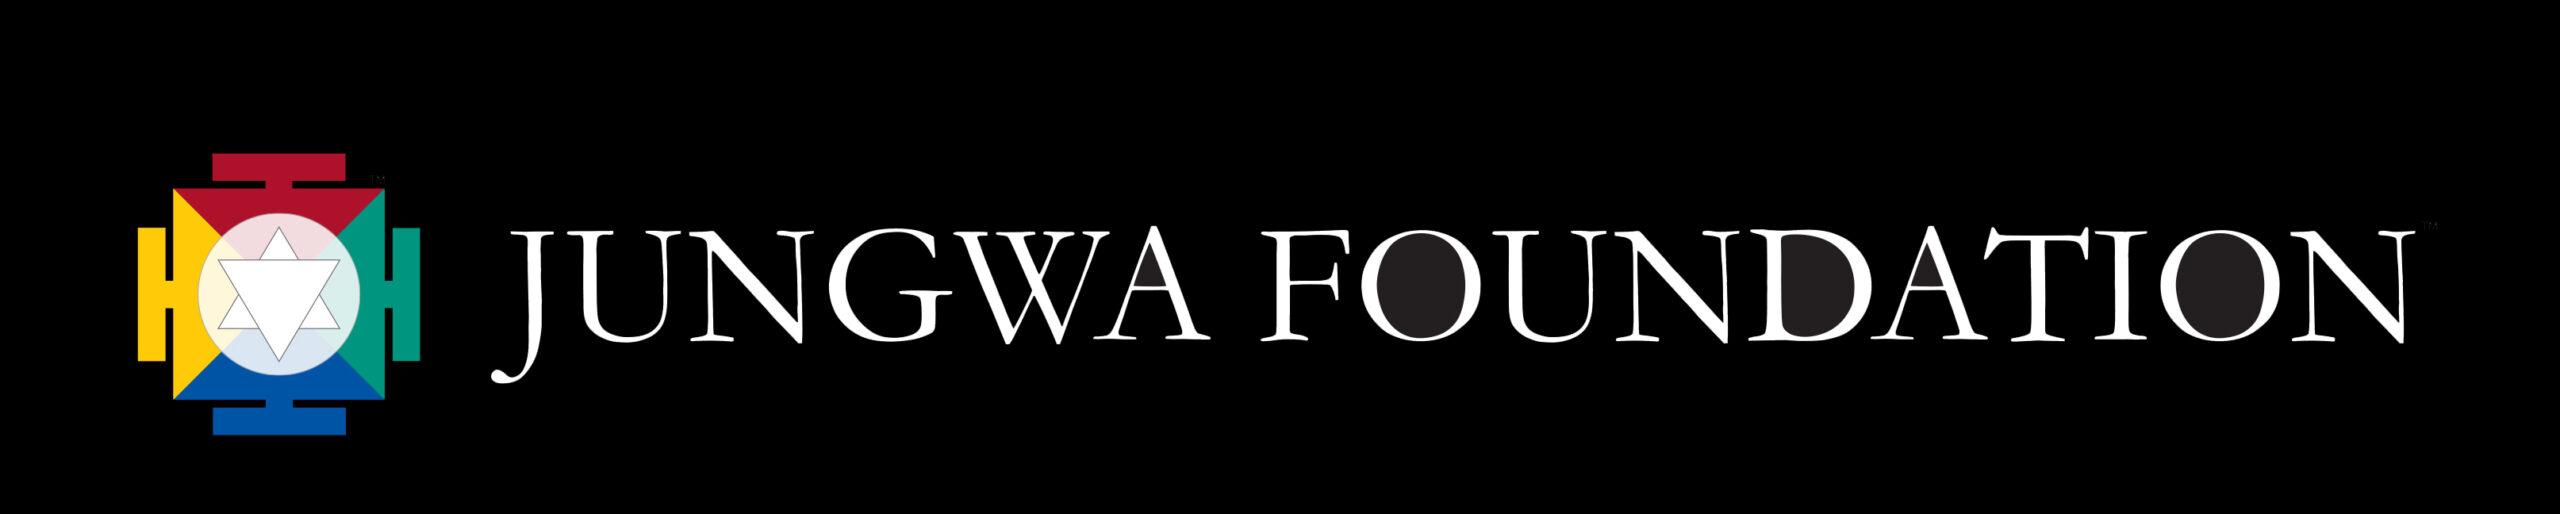 Jungwa Foundation